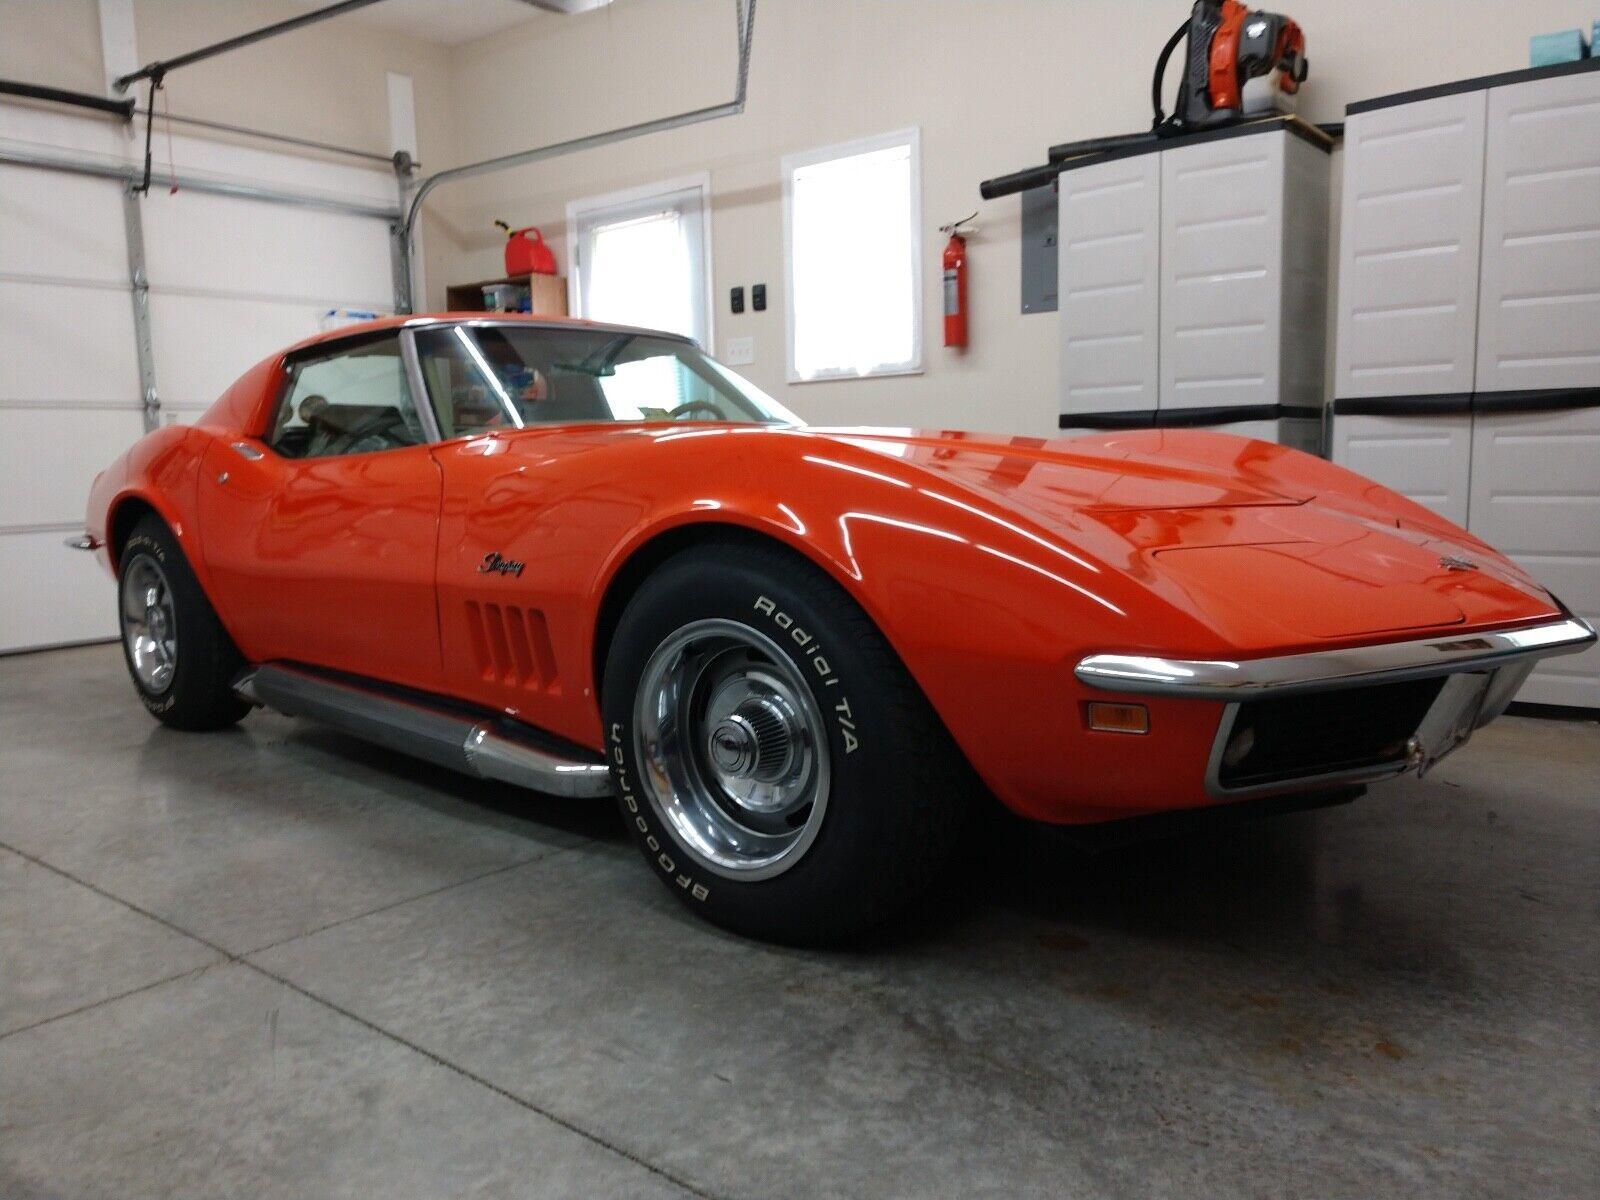 1969 Monaco Orange Chevrolet Corvette Stingray    C3 Corvette Photo 1